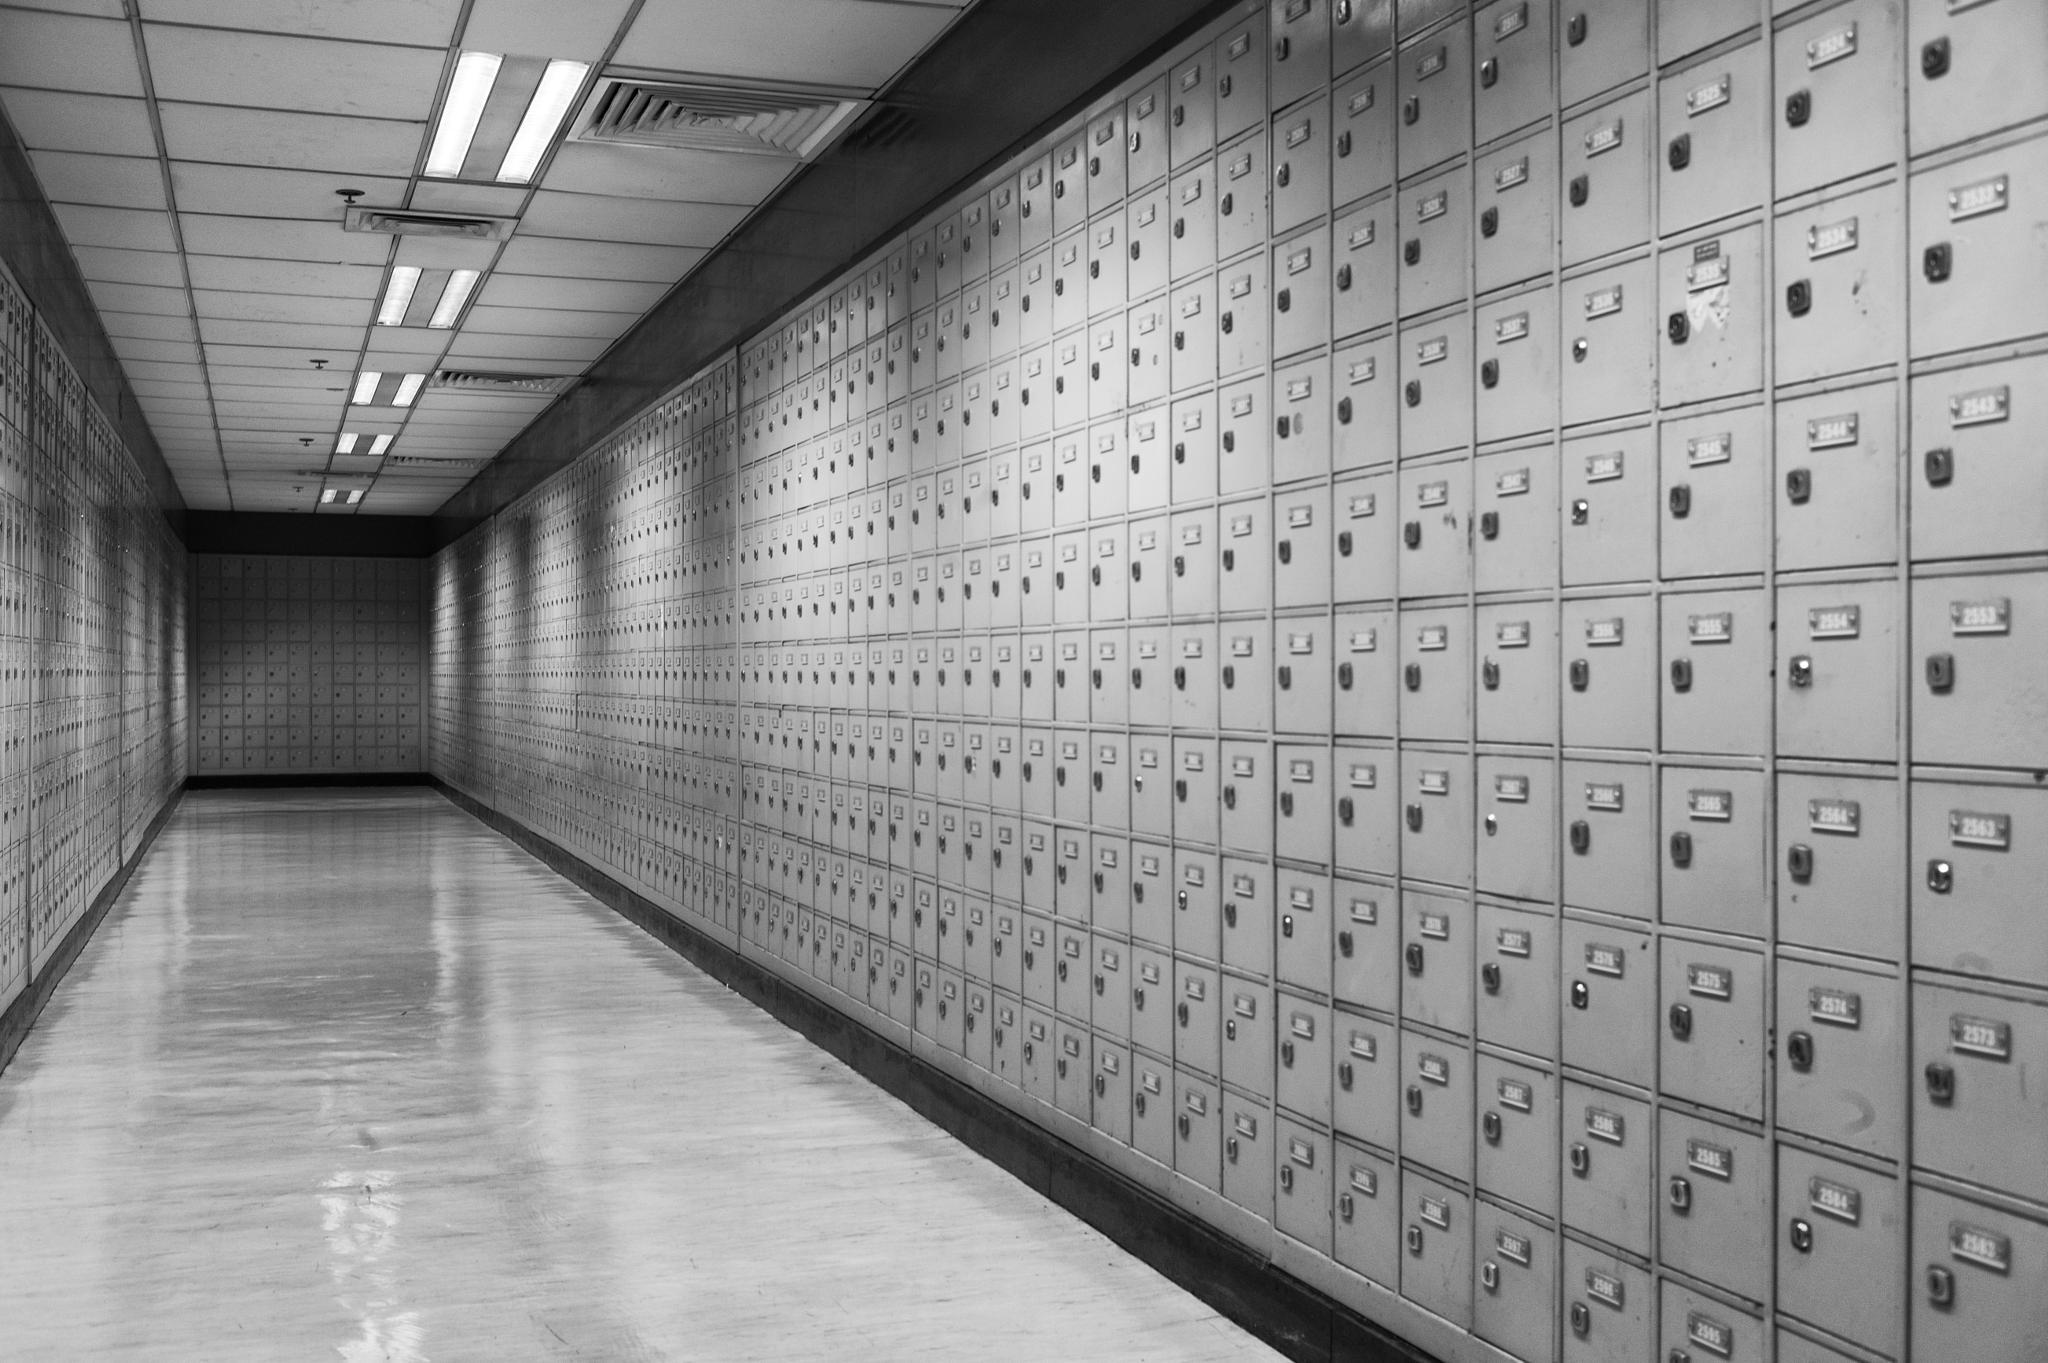 Mailbox by Dickens Lum